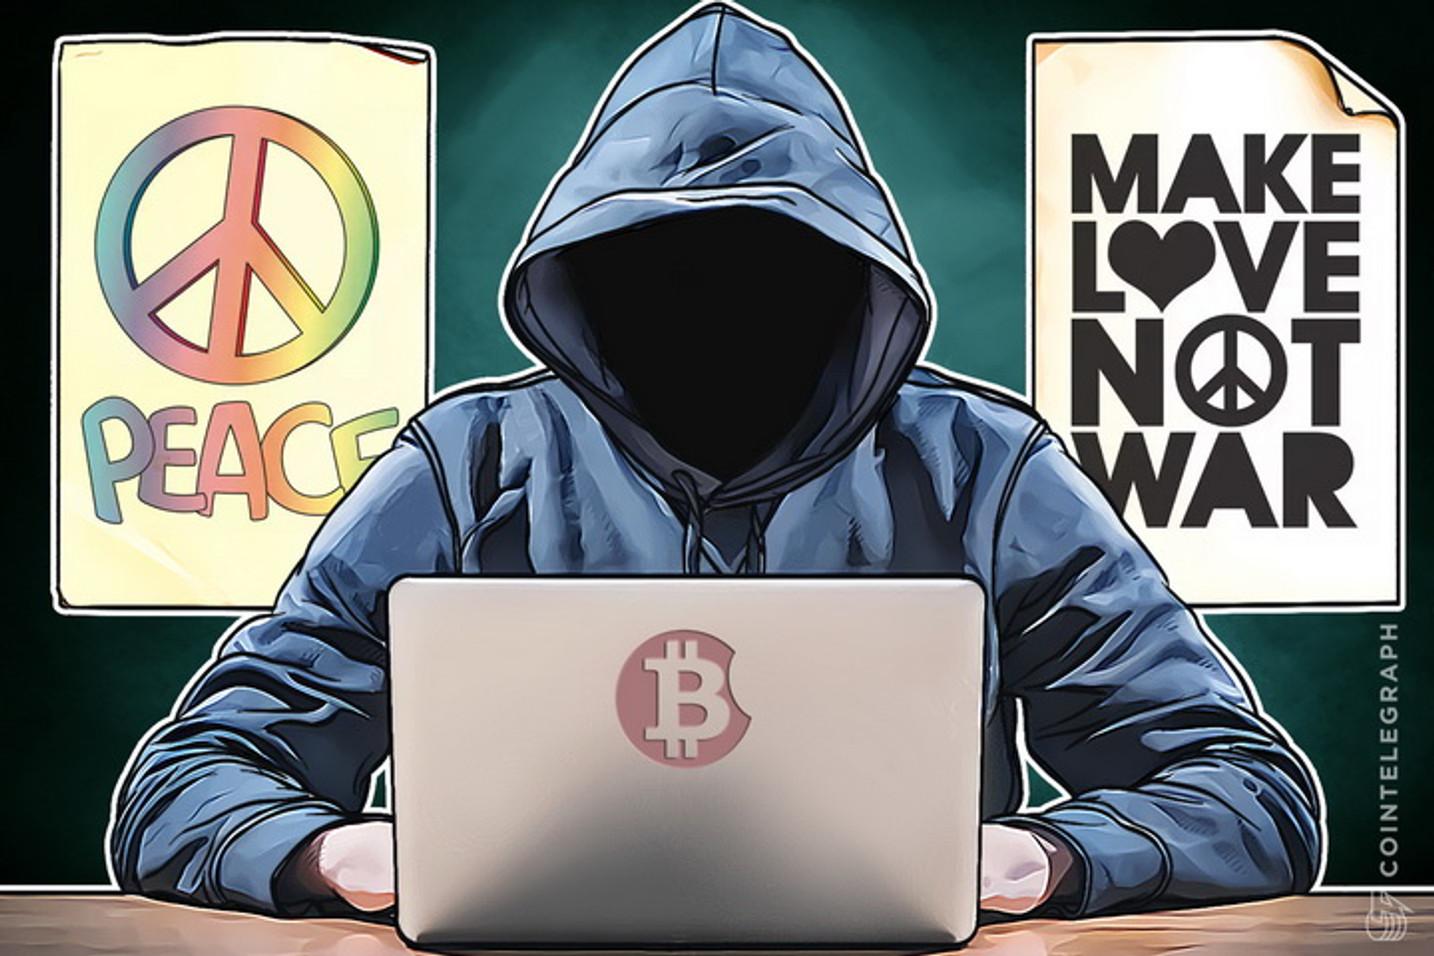 Hacker Donates $11k of Stolen Bitcoin to Kurdish Fighters Battling ISIS